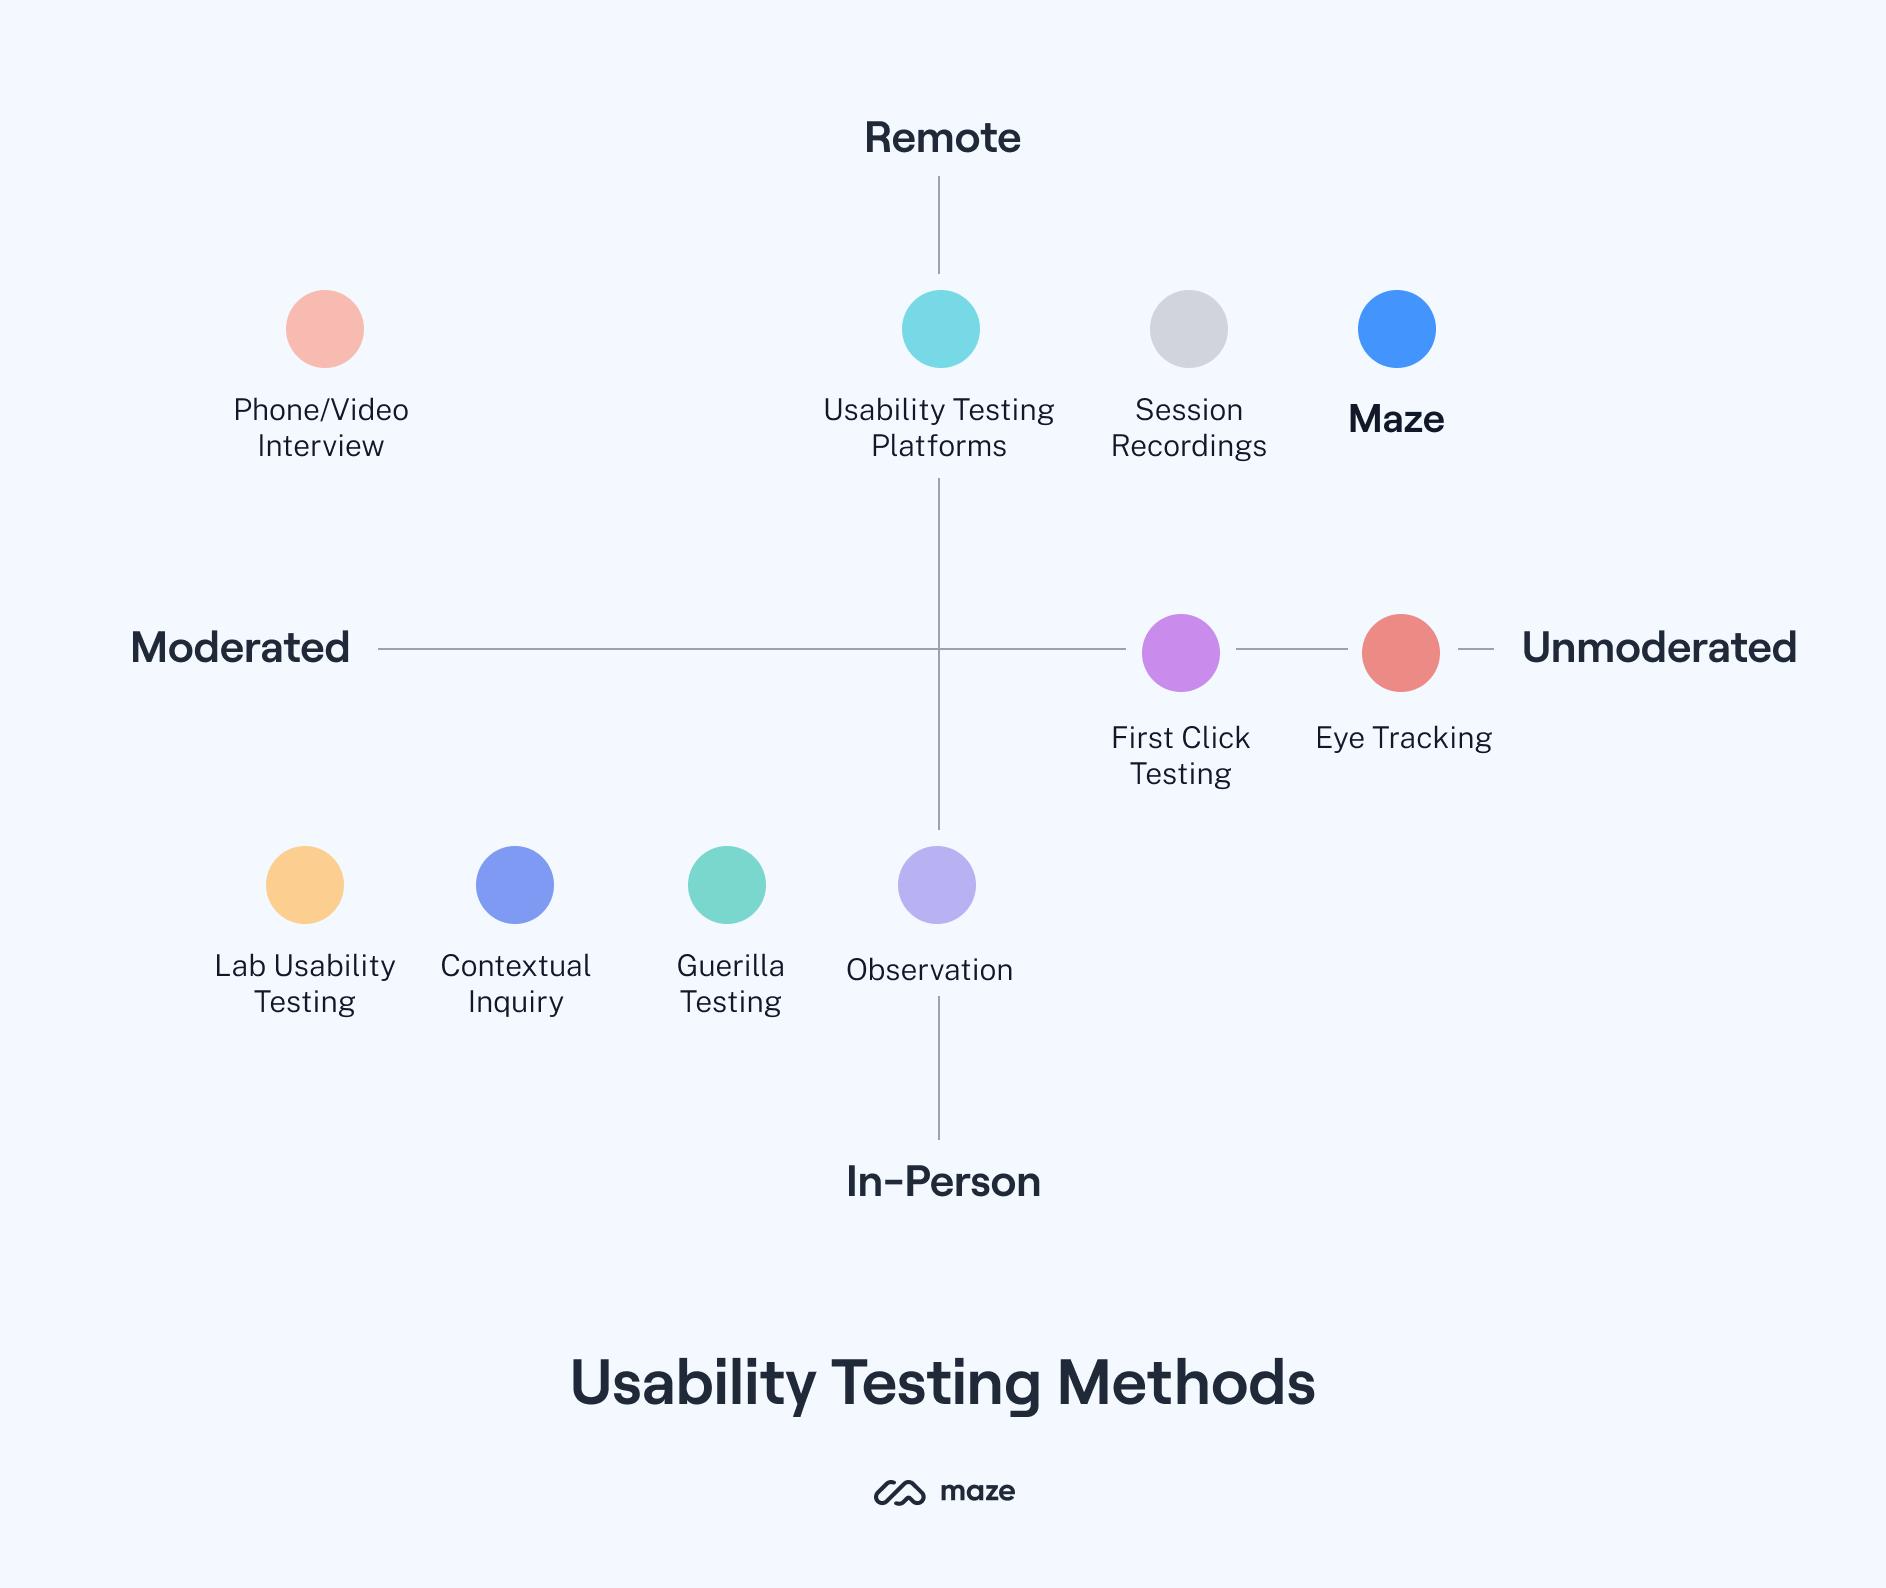 usability testing methods comparison chart